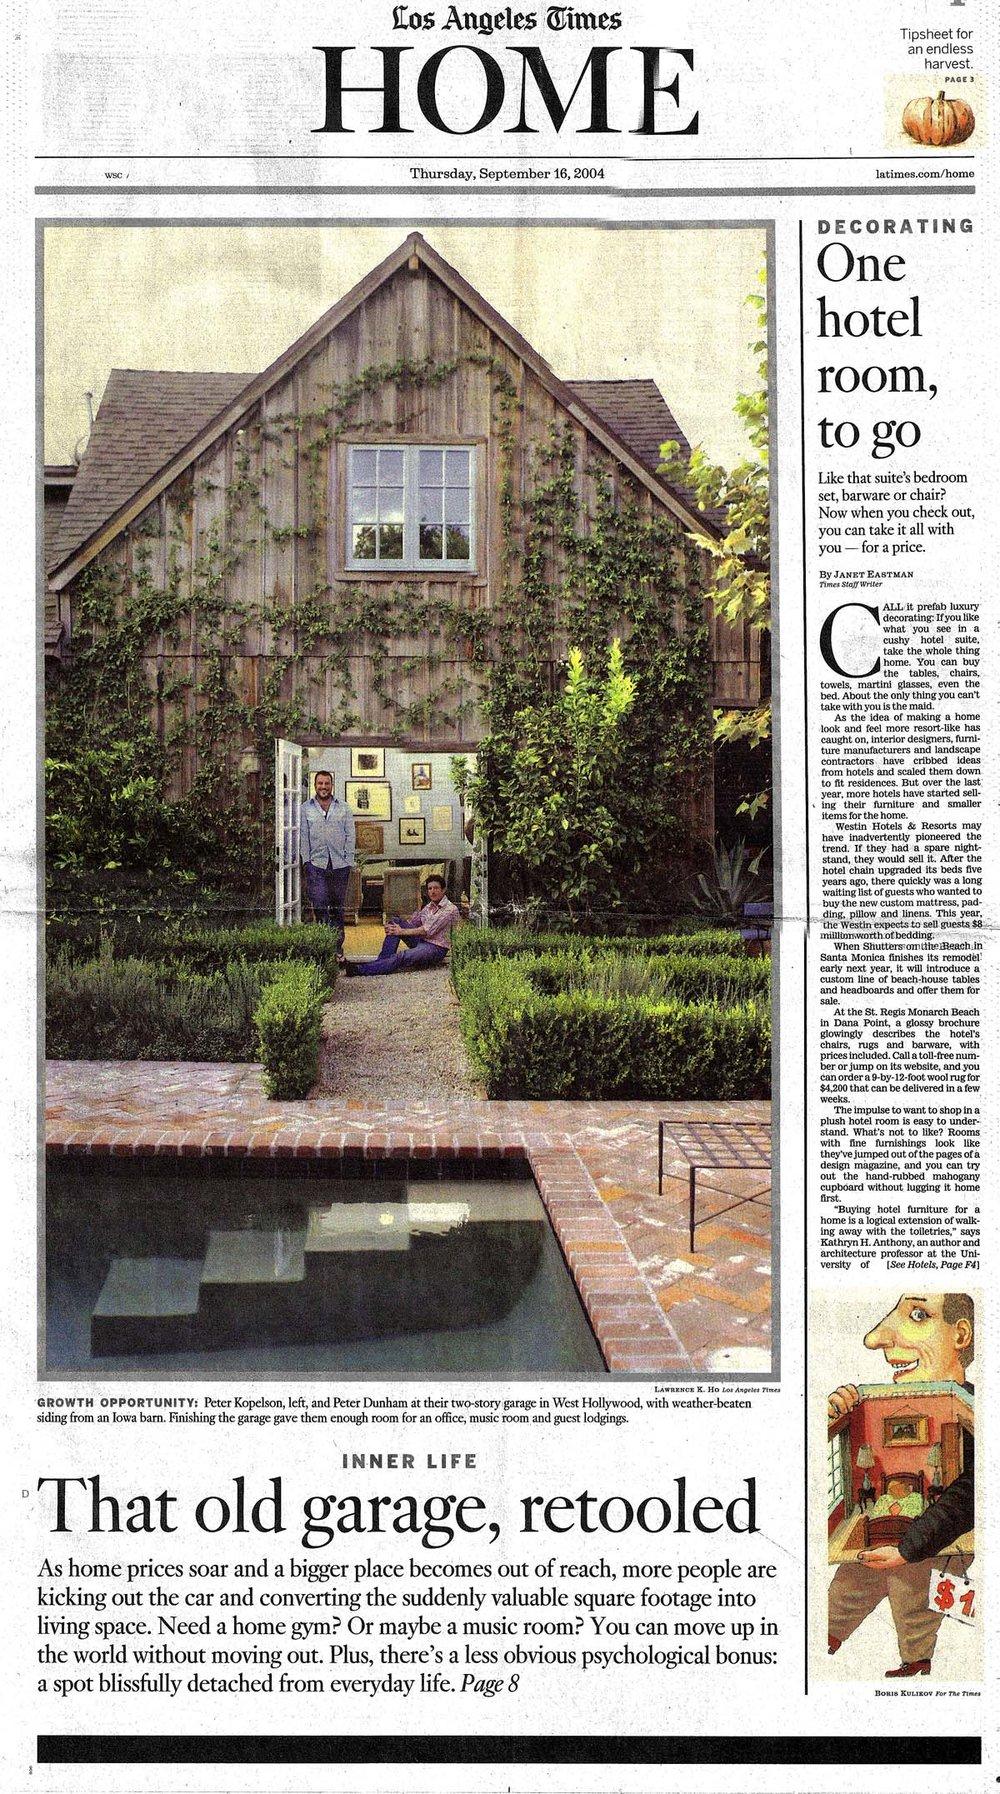 latimes1a-large.jpg